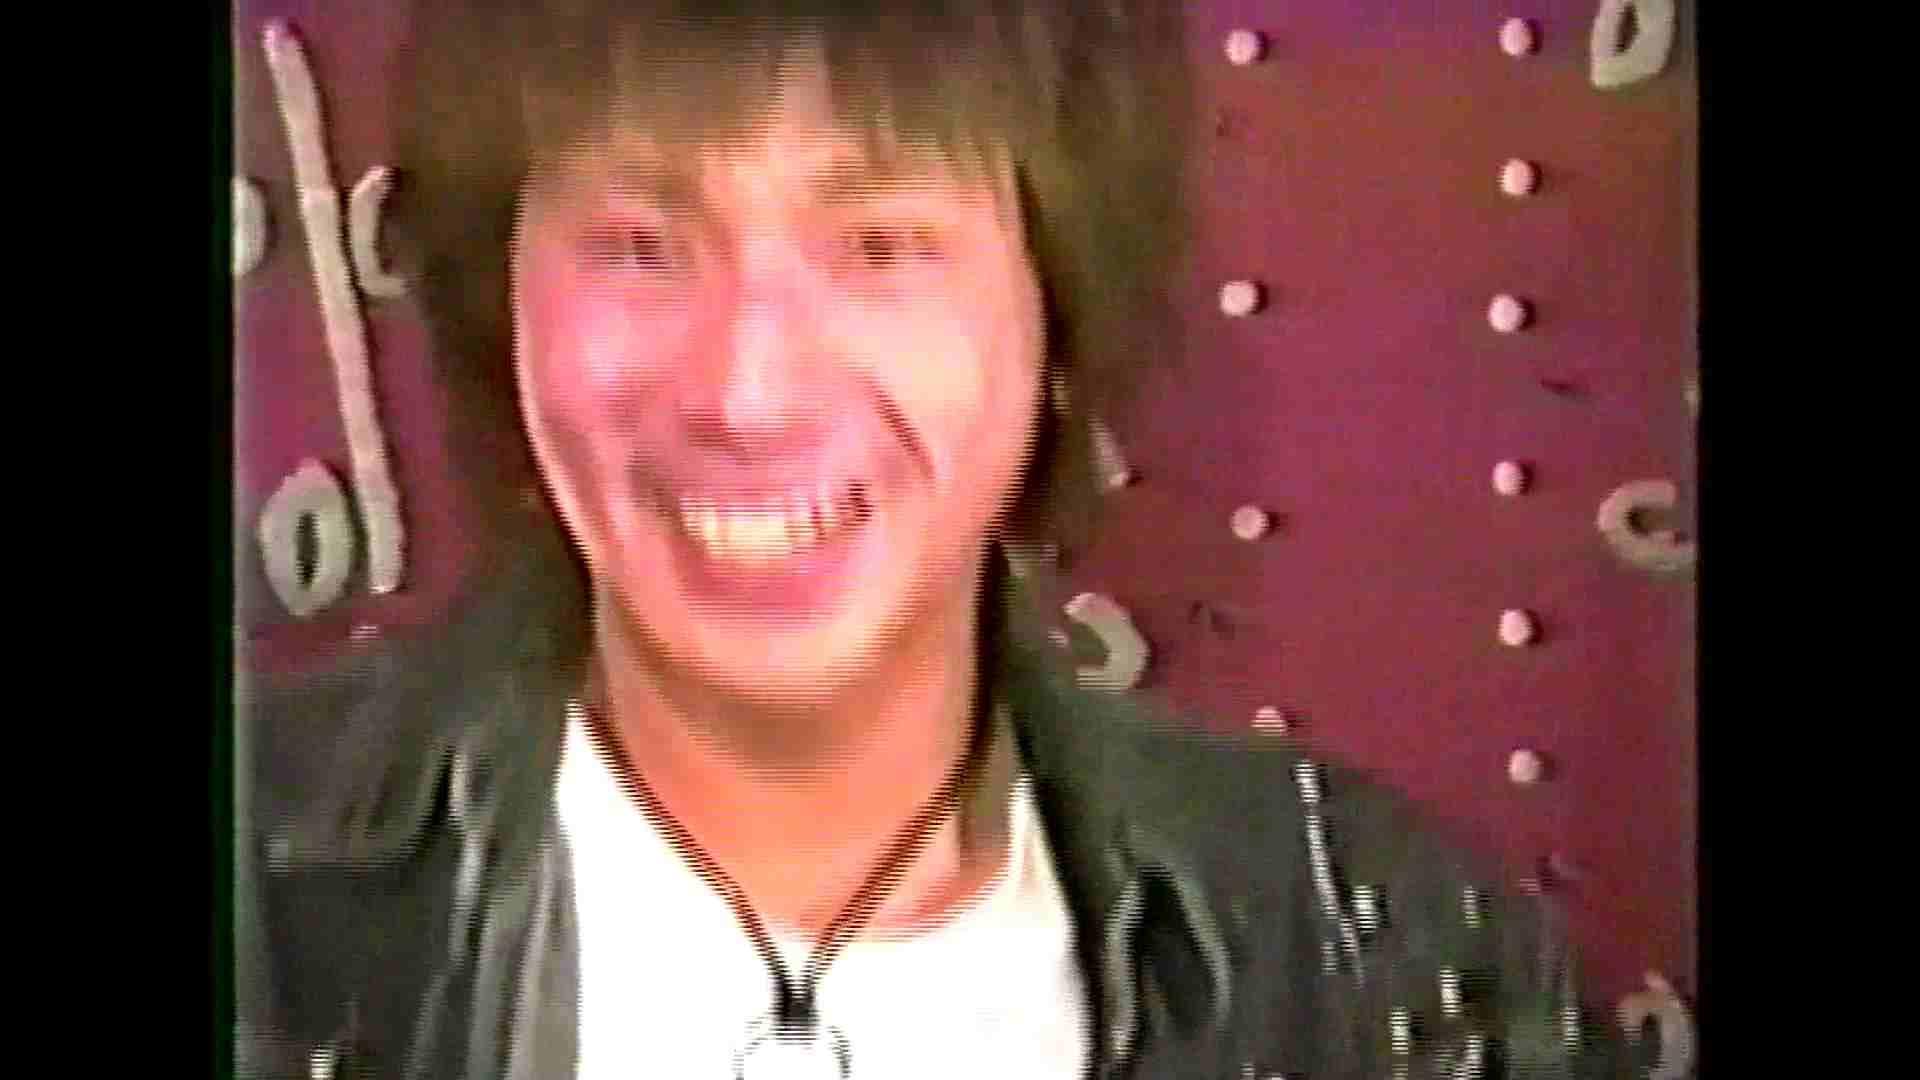 GAYBOY宏のオカズ倉庫Vol.3-1 フェラ天国 ゲイモロ画像 98pic 25